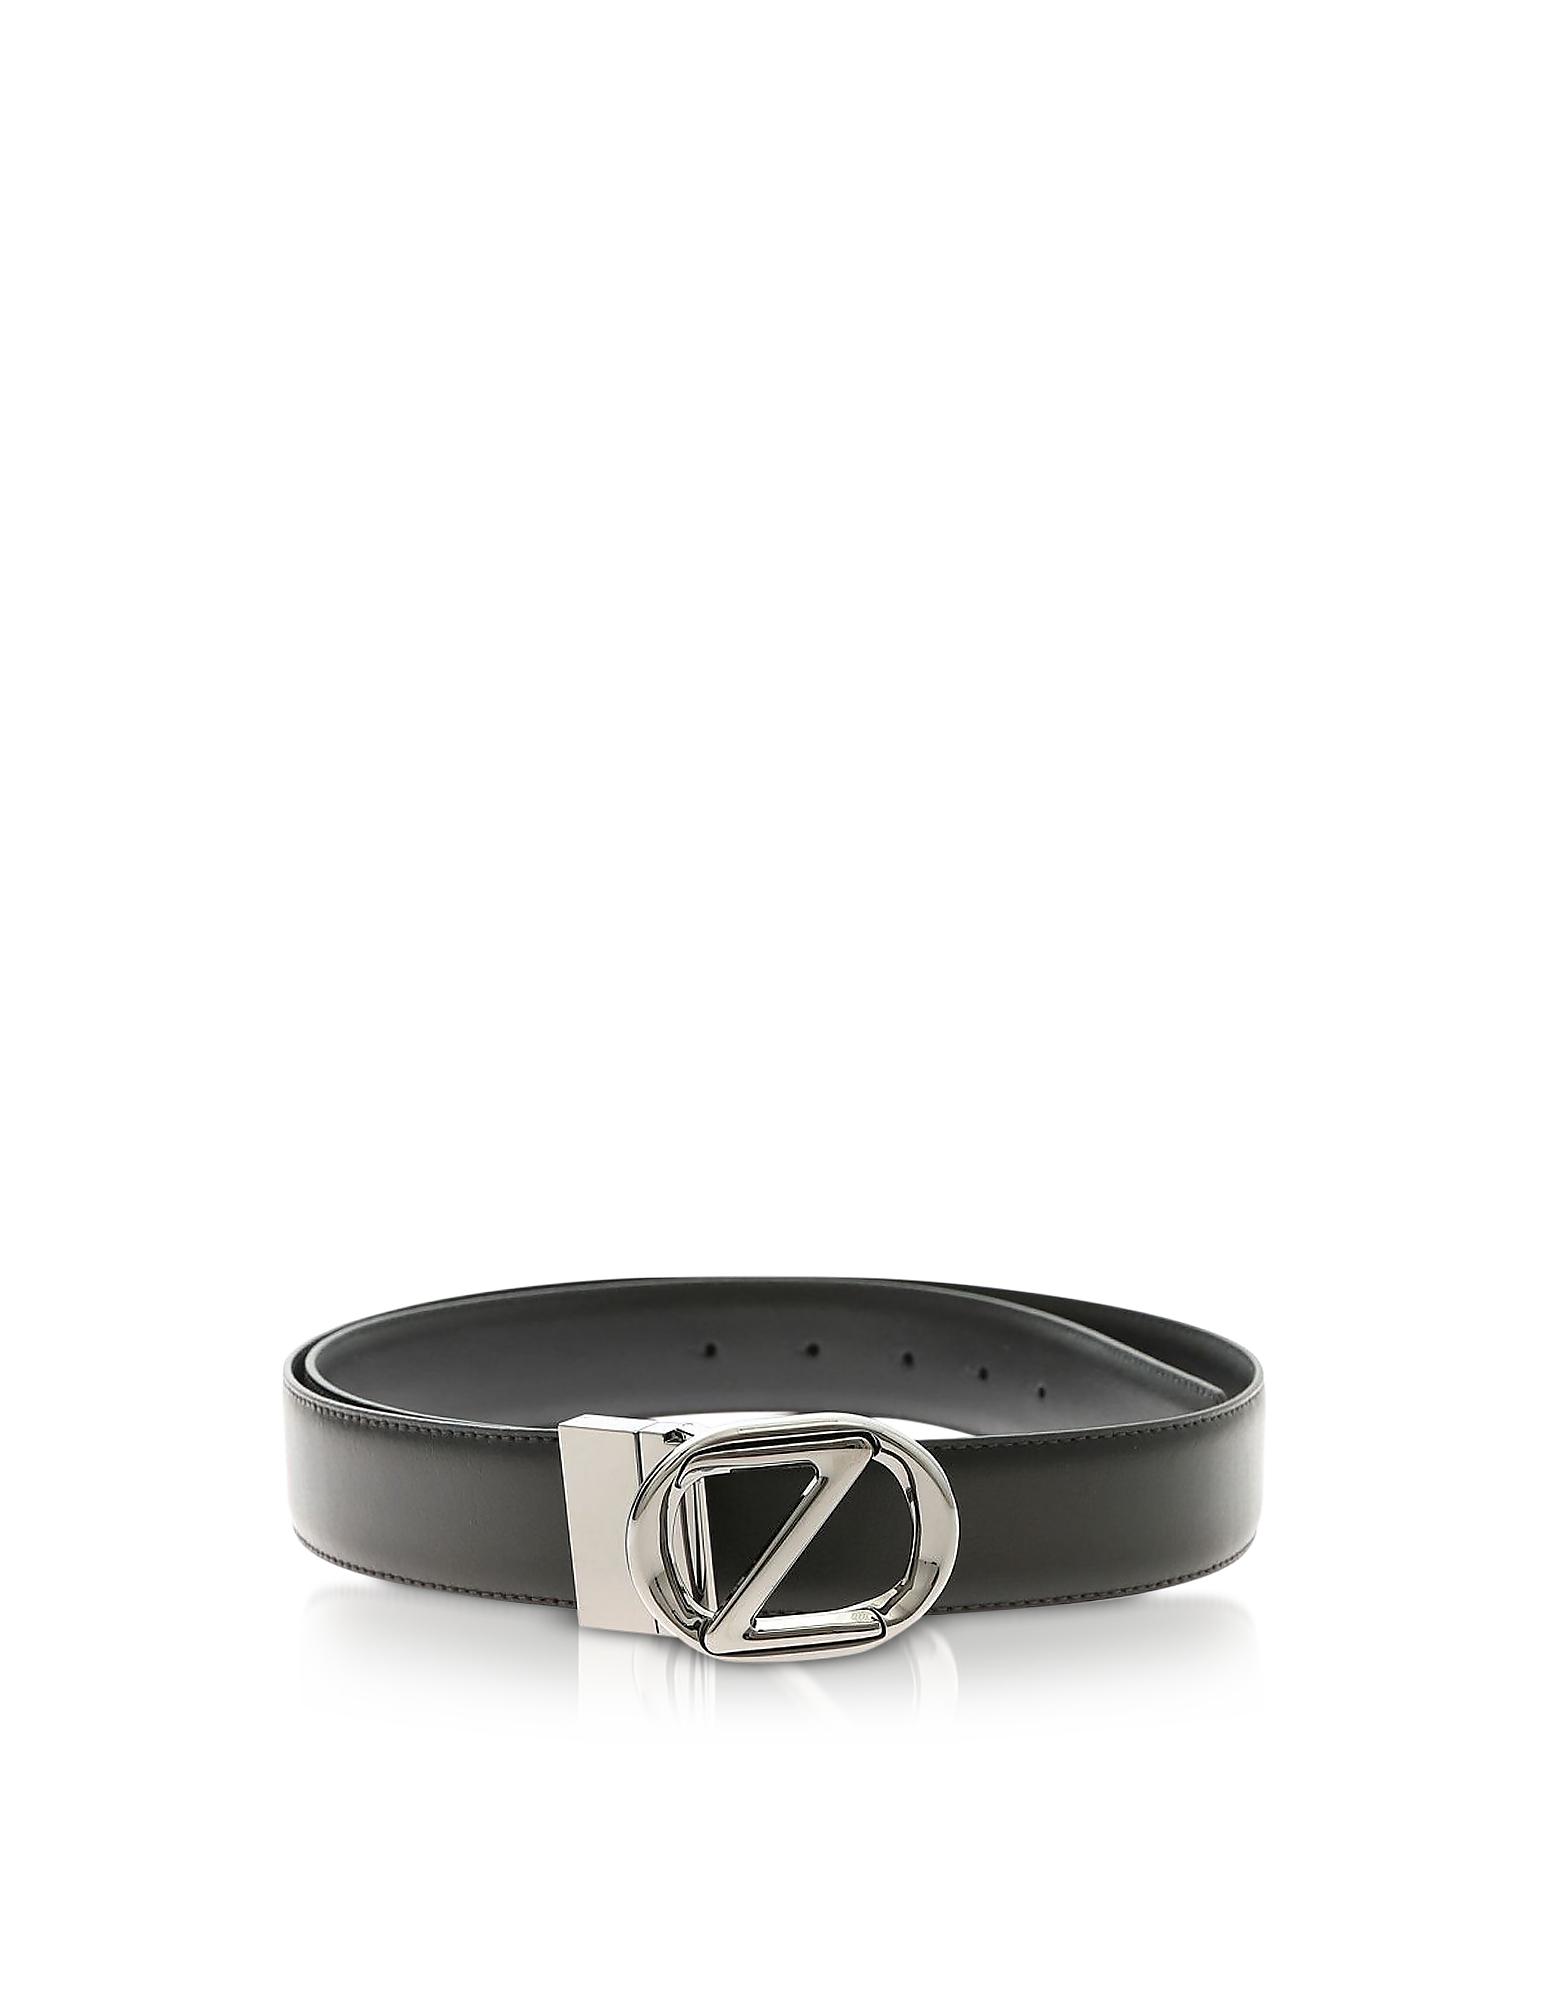 Genuine Leather Reversible and Adjustable Men's Belt